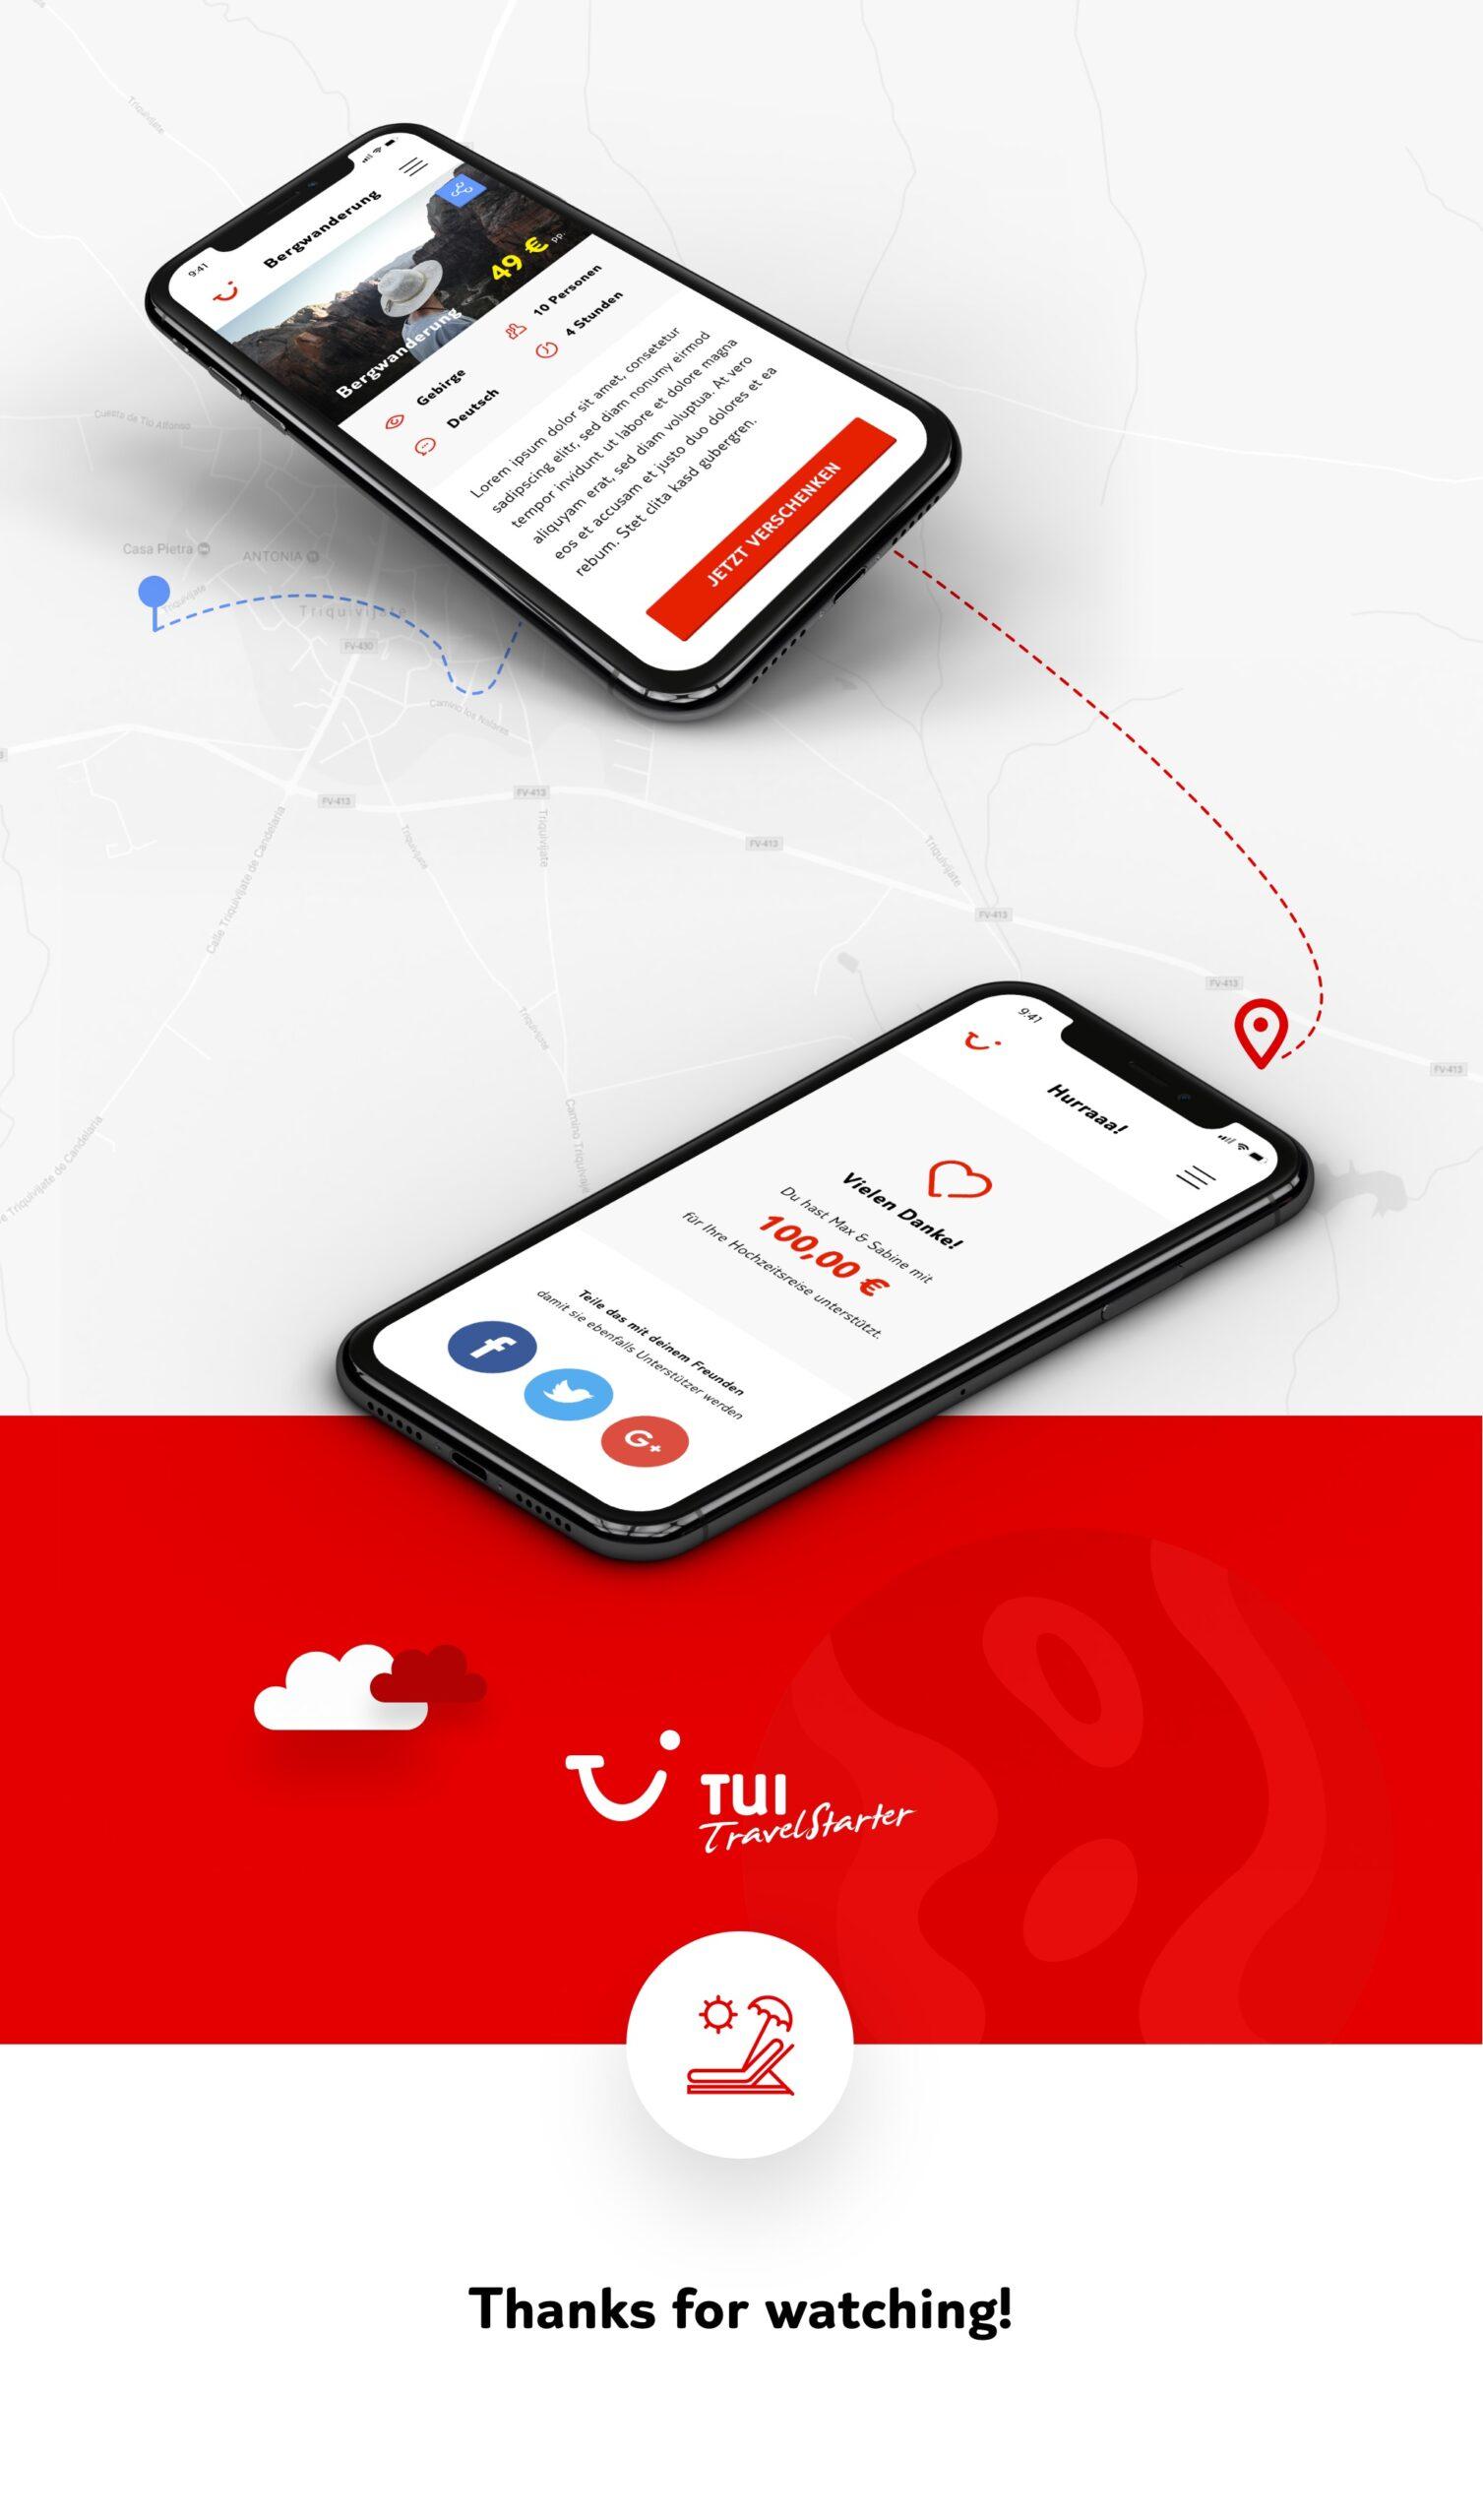 TUI-TravelStarter-App-and-Website-Web-07@2x